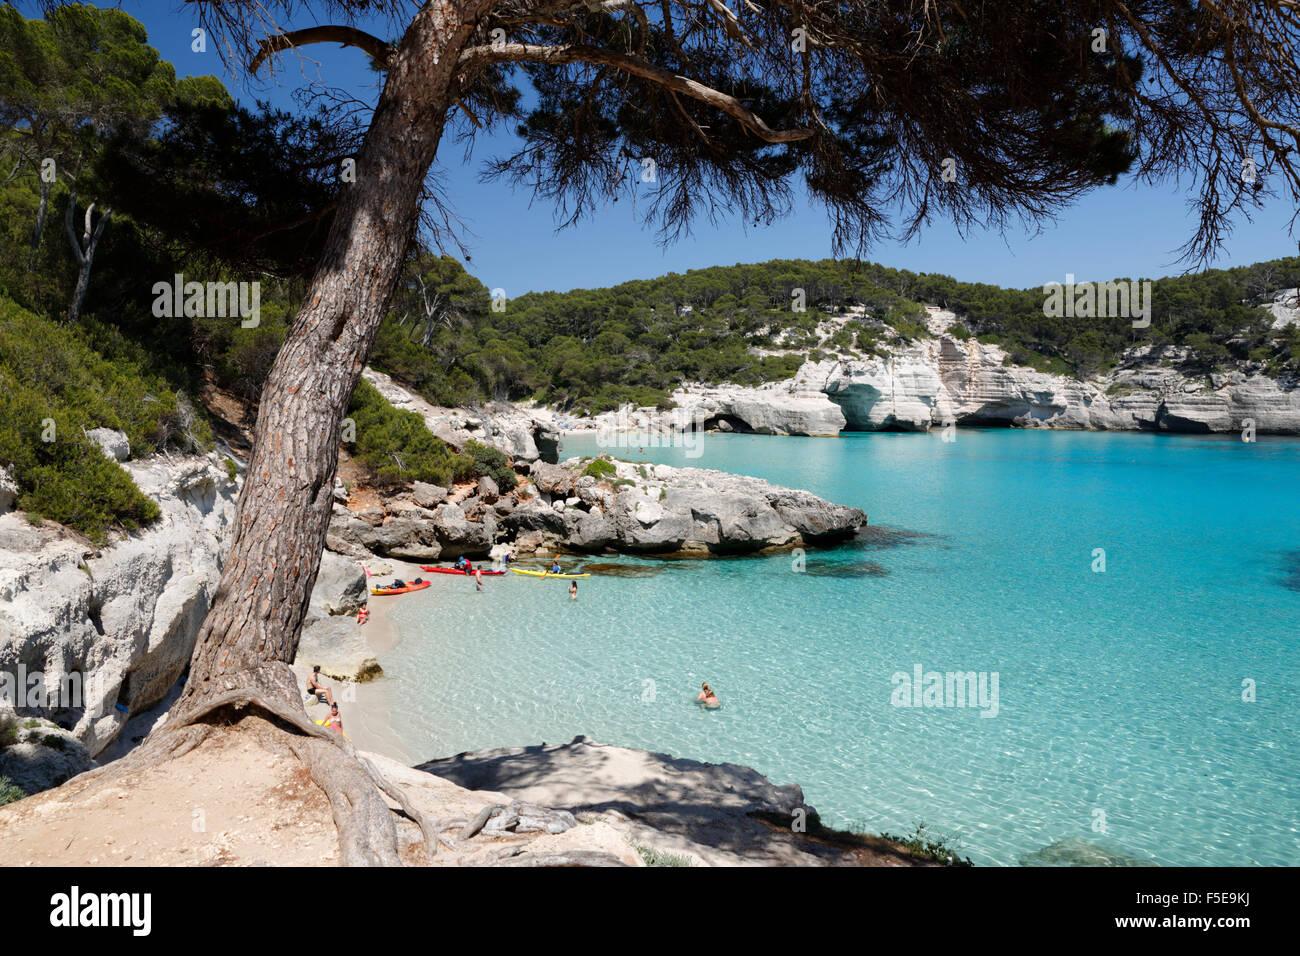 Cala Mitjana, near Cala Galdana, south west coast, Menorca, Balearic Islands, Spain, Mediterranean, Europe - Stock Image